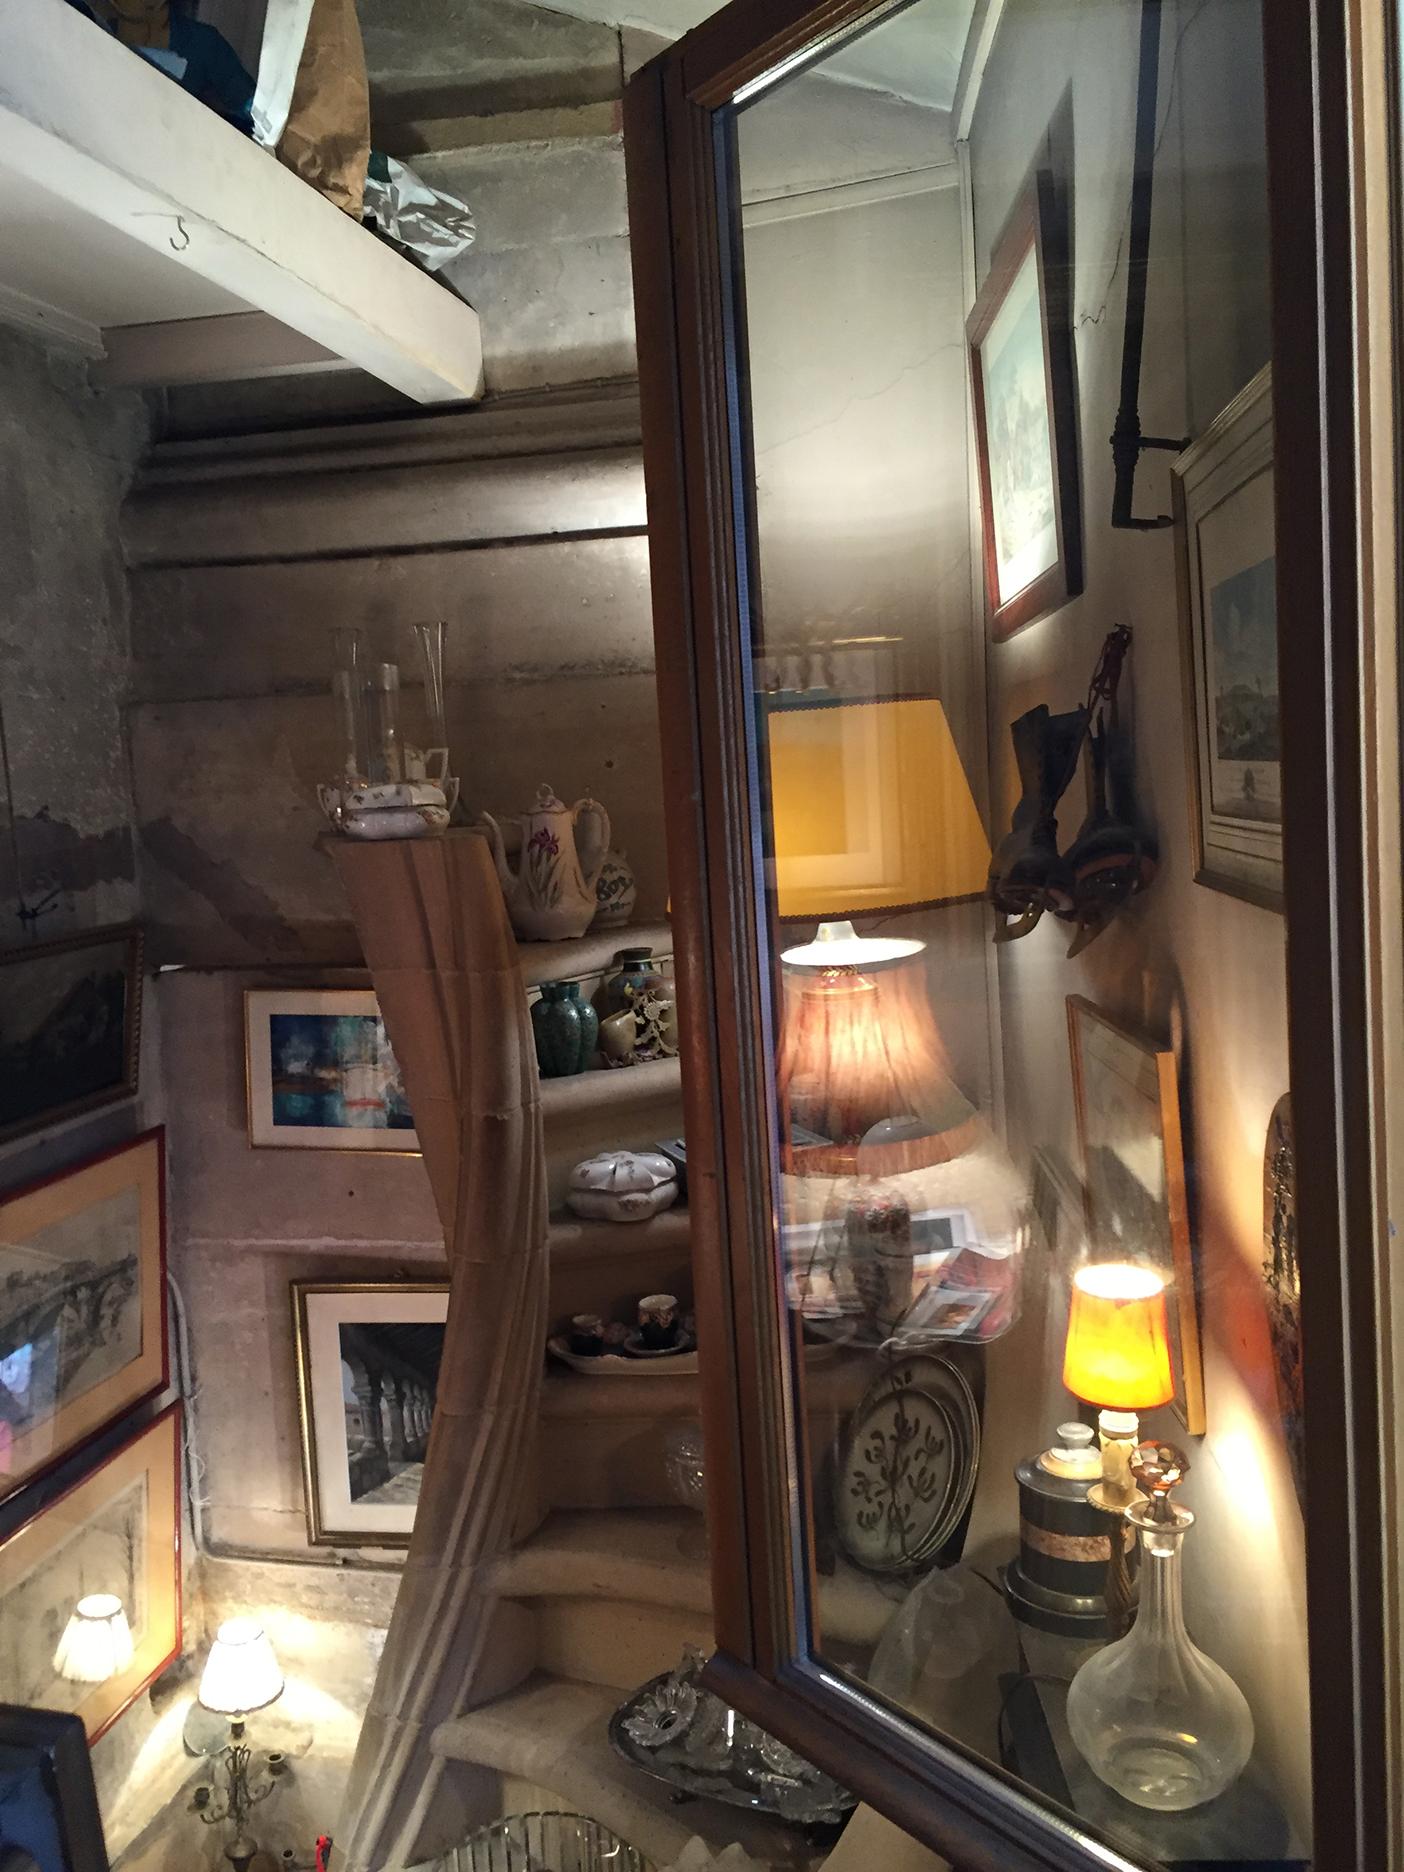 Second floor at Rarissime